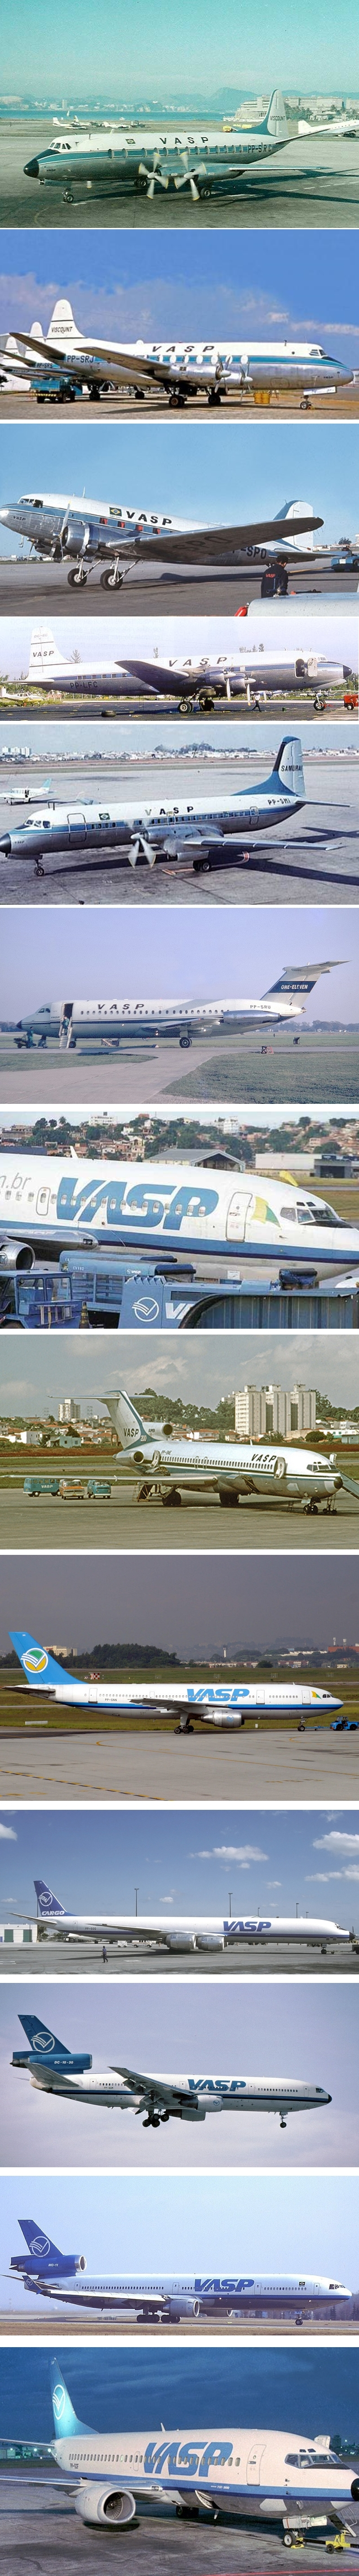 AW-VASP_History_001.jpg